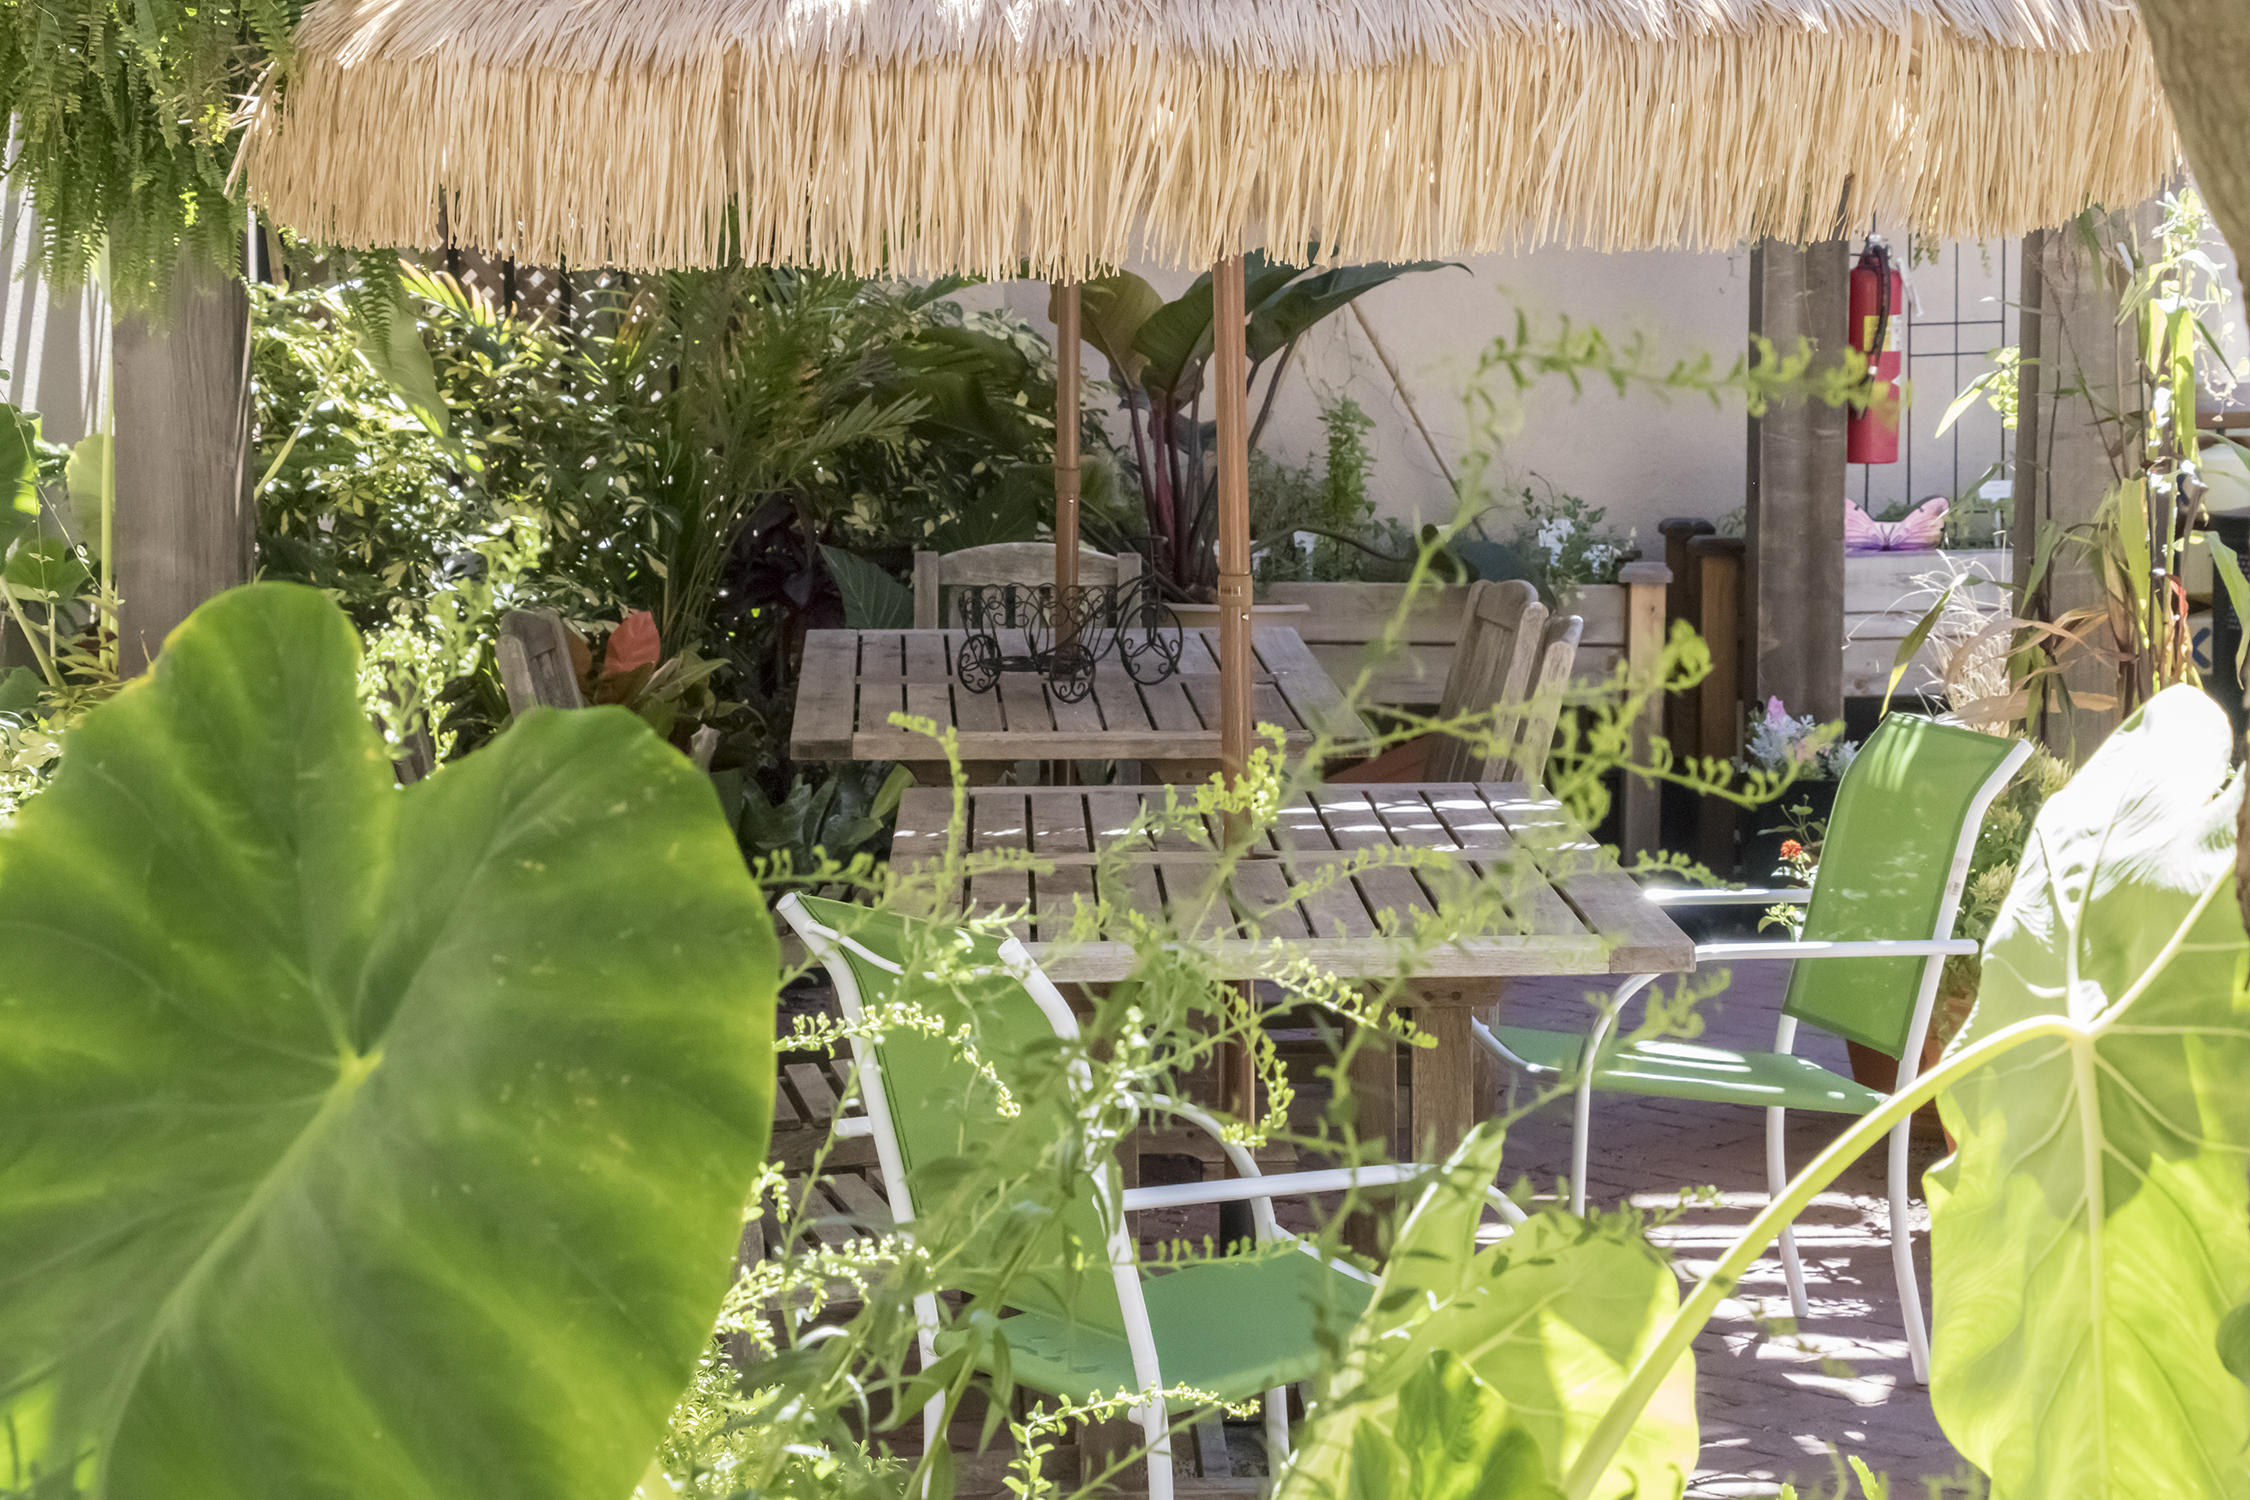 image inside conservatory